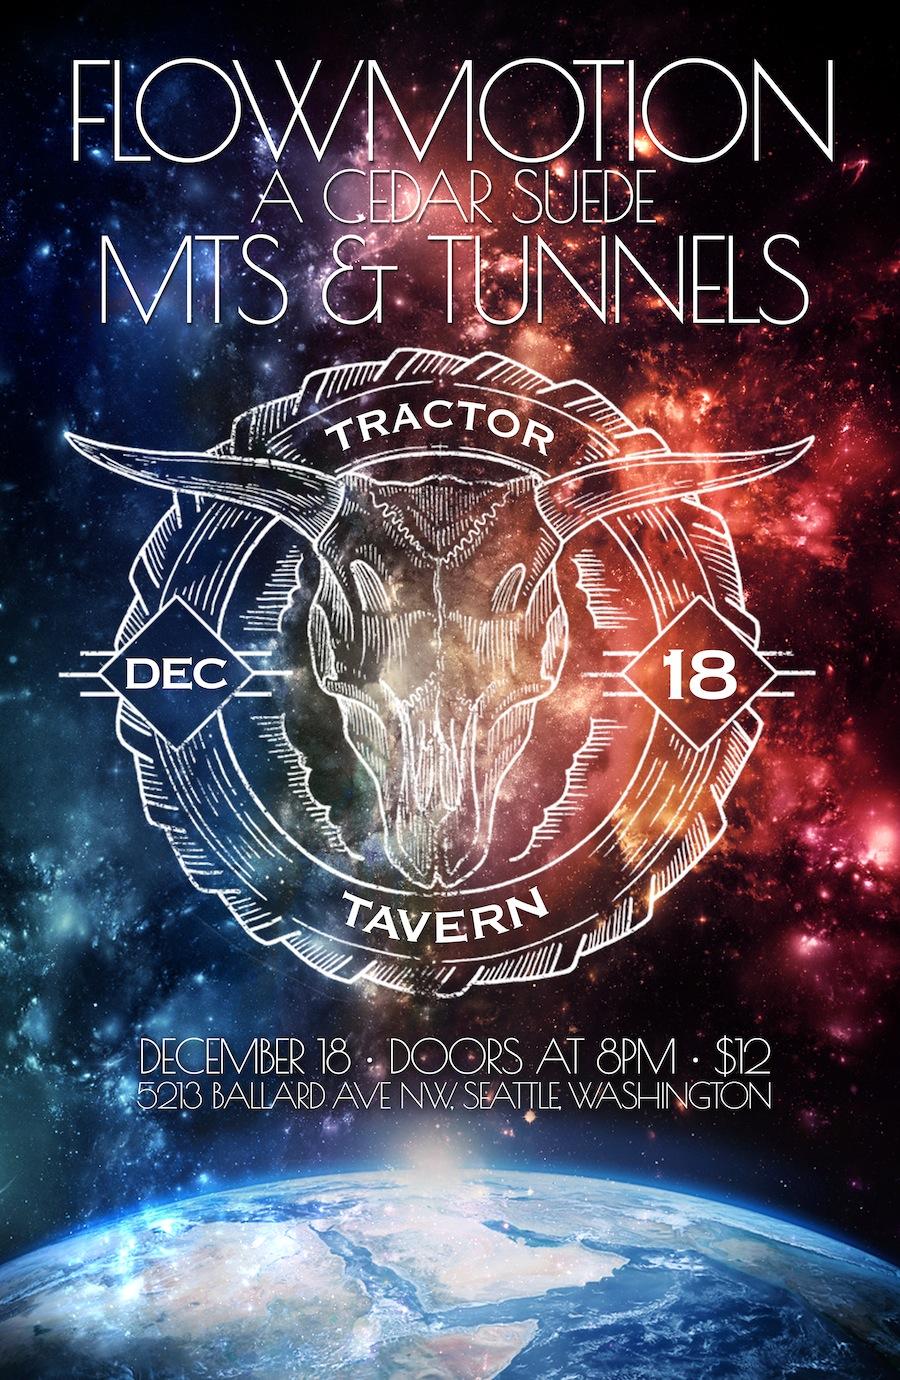 12.18.2015_Flowmo_Tractor_Final